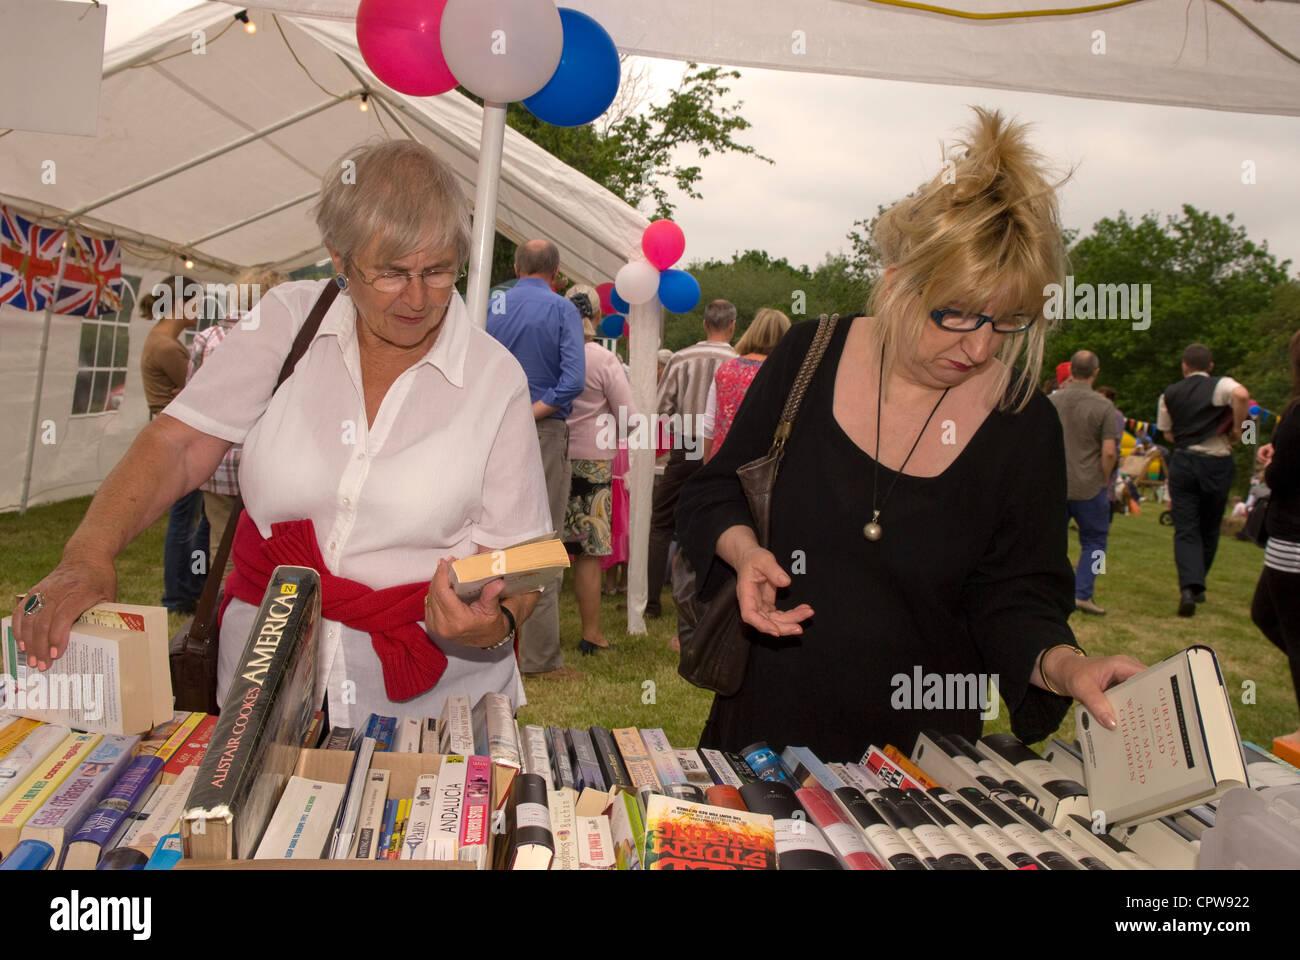 Women perusing book stall at Dockenfield fete & Diamond Jubilee celebration day, Dockenfield, Surrey, UK. - Stock Image